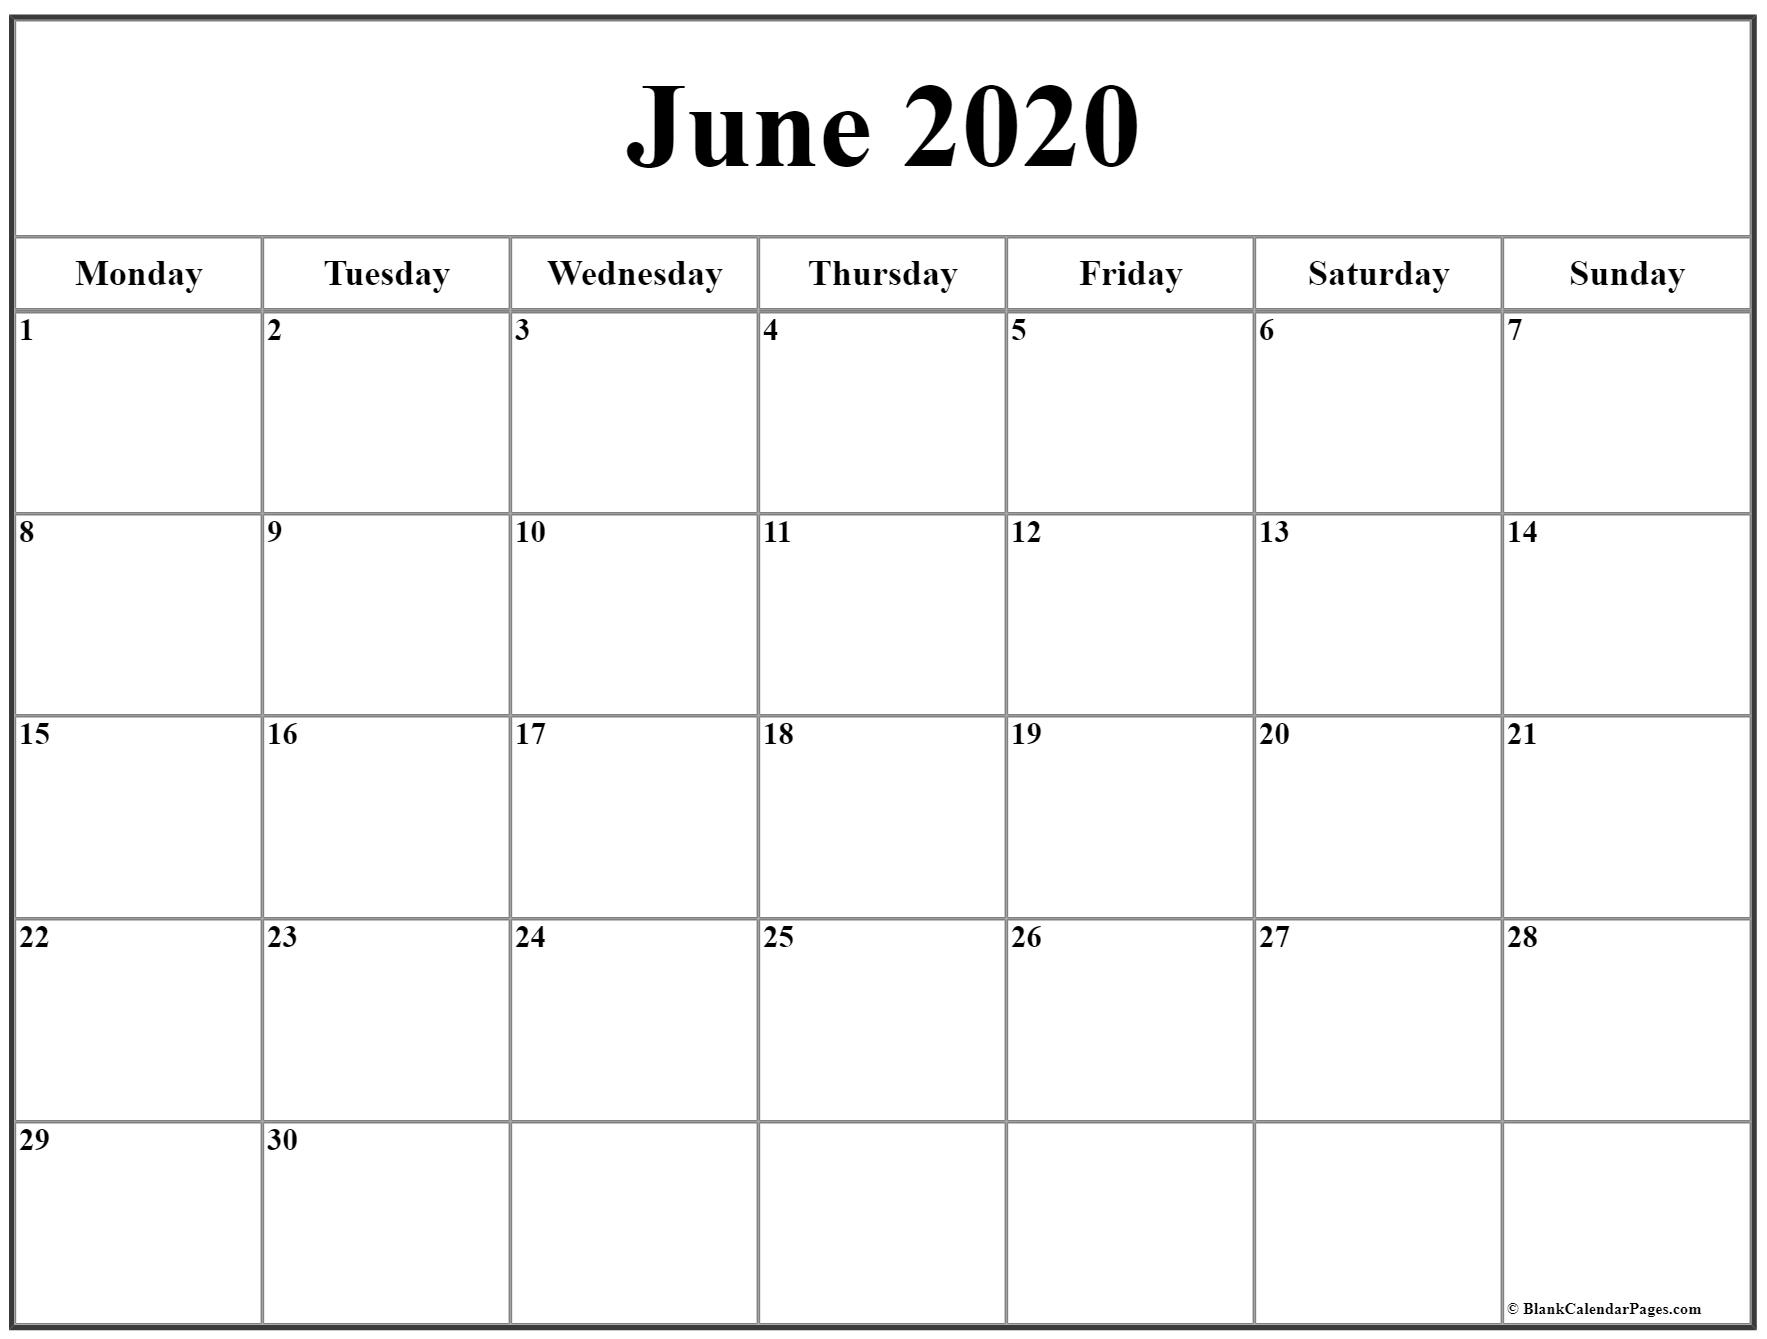 June 2020 Monday Calendar   Monday To Sunday